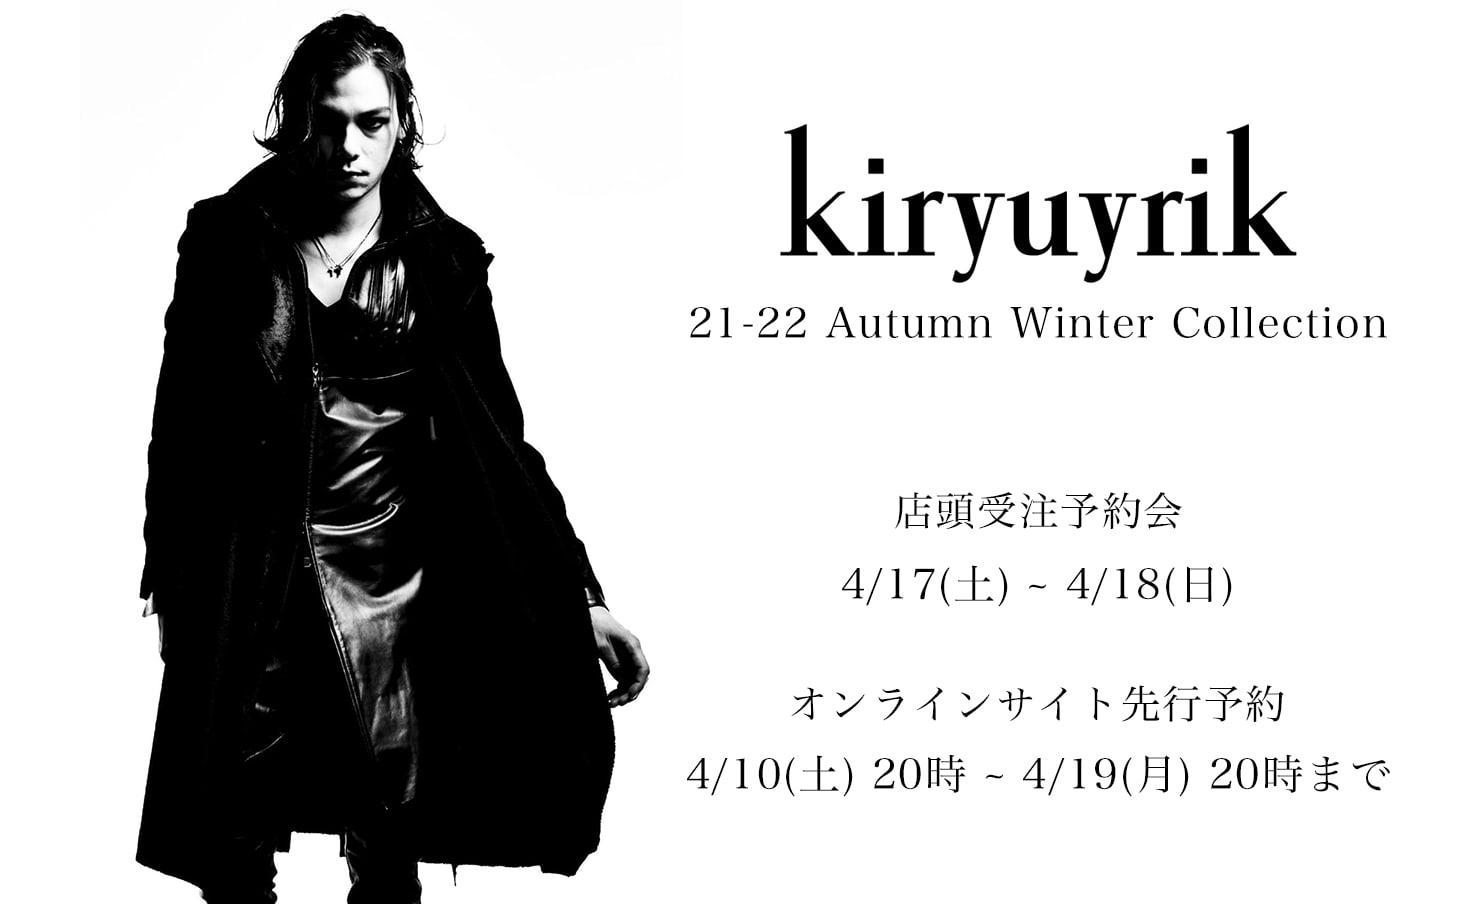 kiryuyrik (キリュウキリュウ) 21-22AW(秋冬) コレクション 先行予約